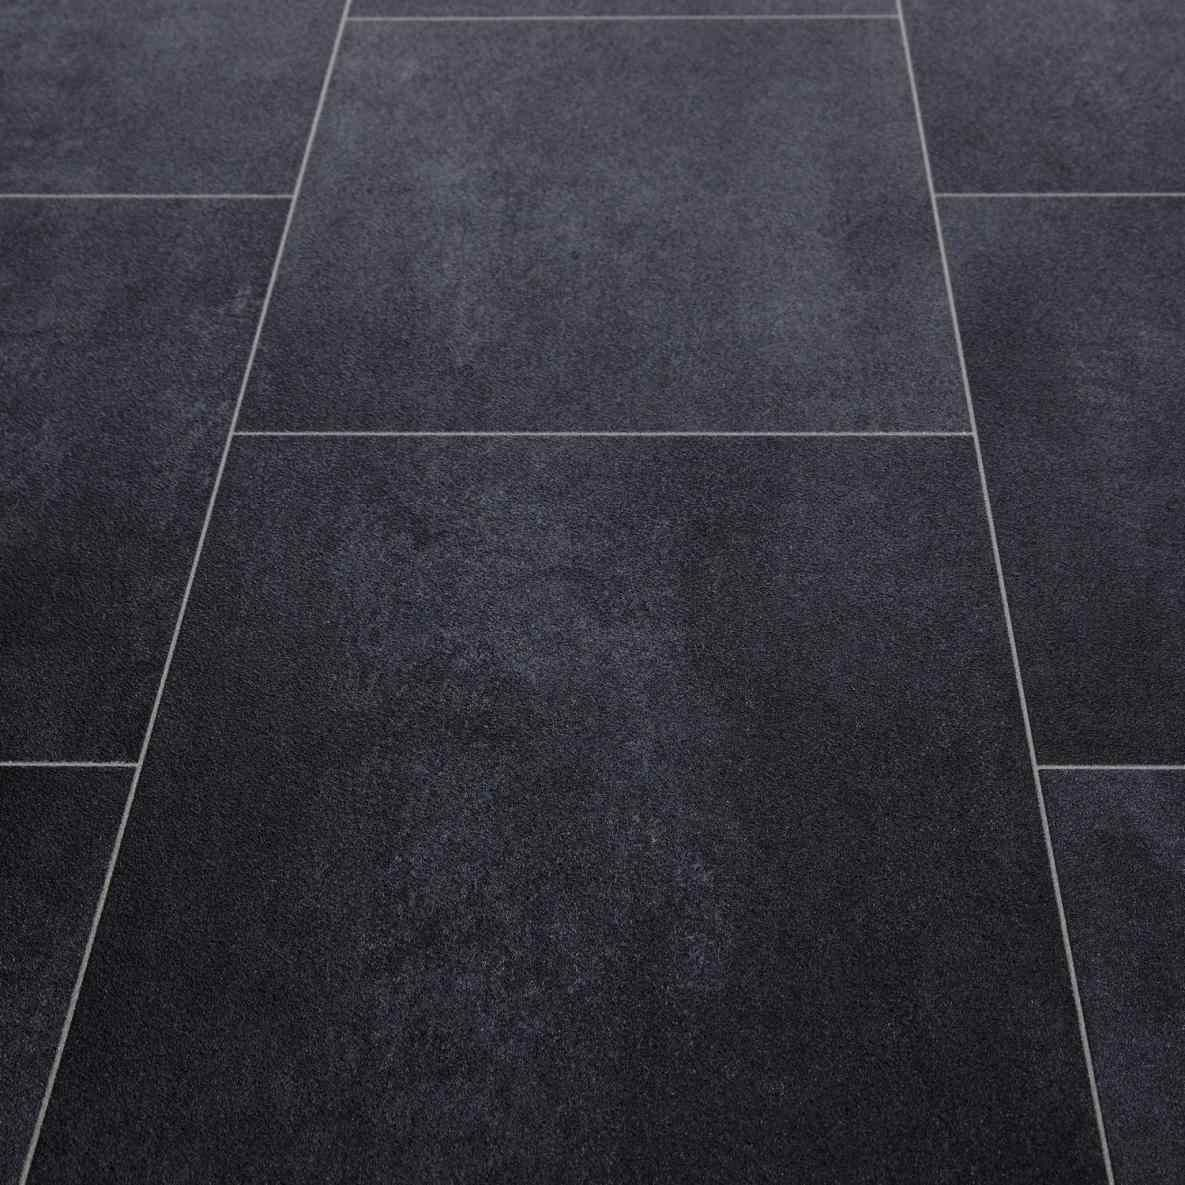 Black glitter self adhesive floor tiles httpnextsoft21 black glitter self adhesive floor tiles doublecrazyfo Gallery